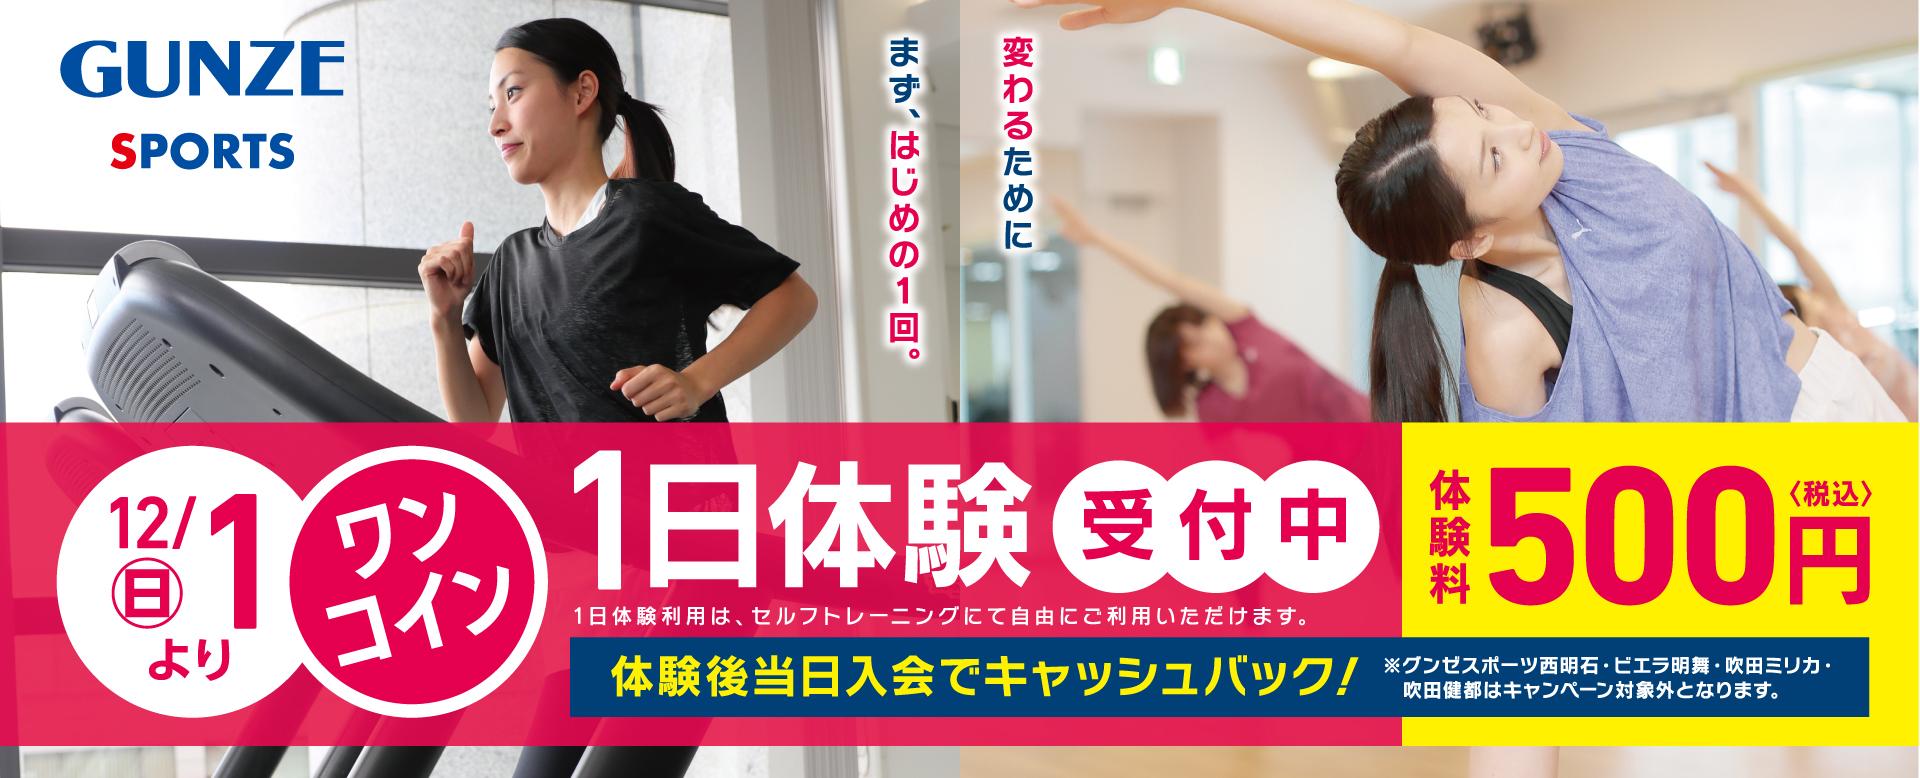 Gunzesports yawata グンゼスポーツ 京都八幡